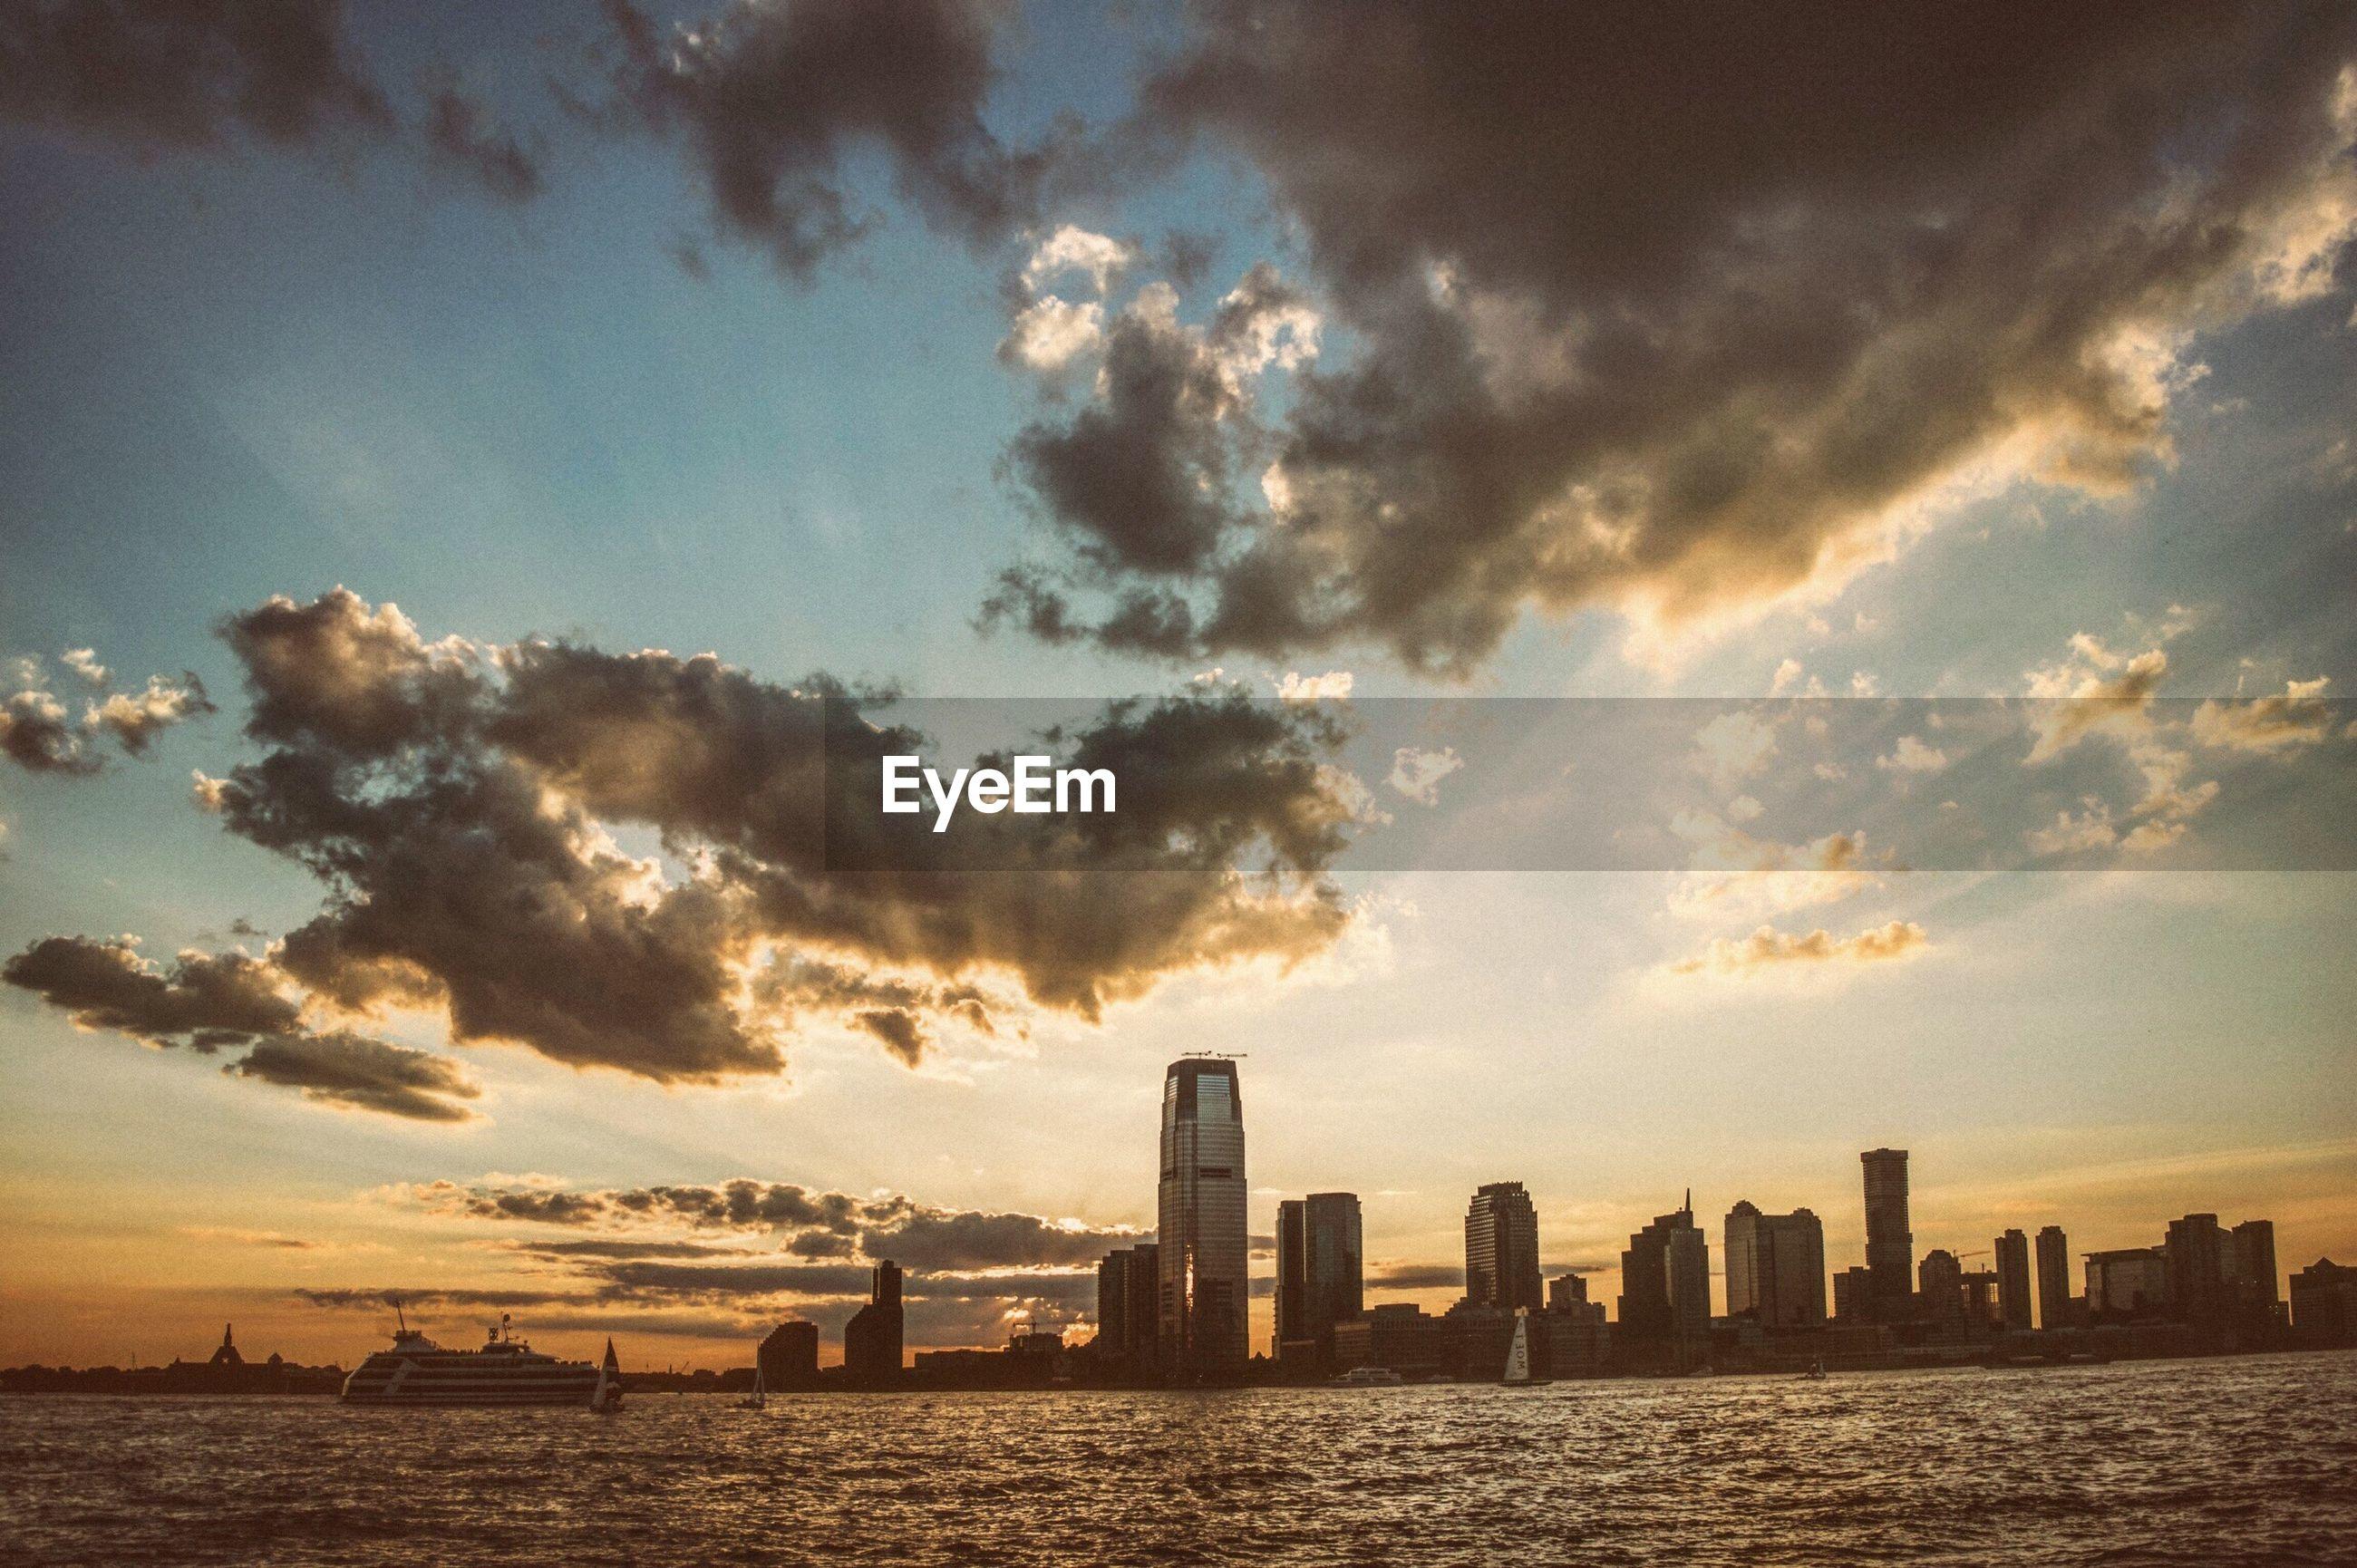 SEA AND CITYSCAPE AGAINST SKY